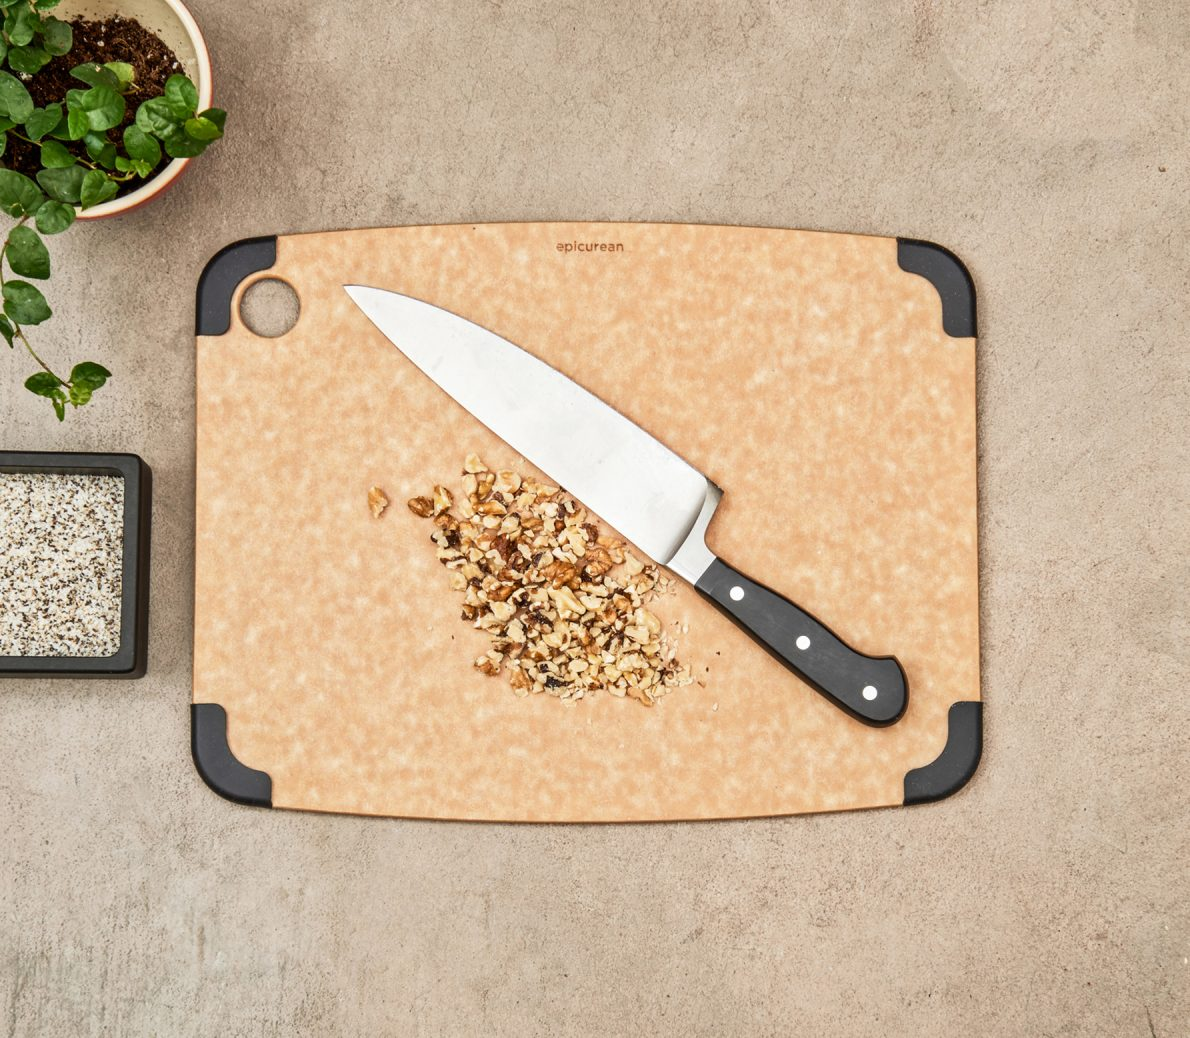 epicurean-cutting-board-nonslip-series-natural-slate-15x11-20215110103-env1-1190x1038.jpg